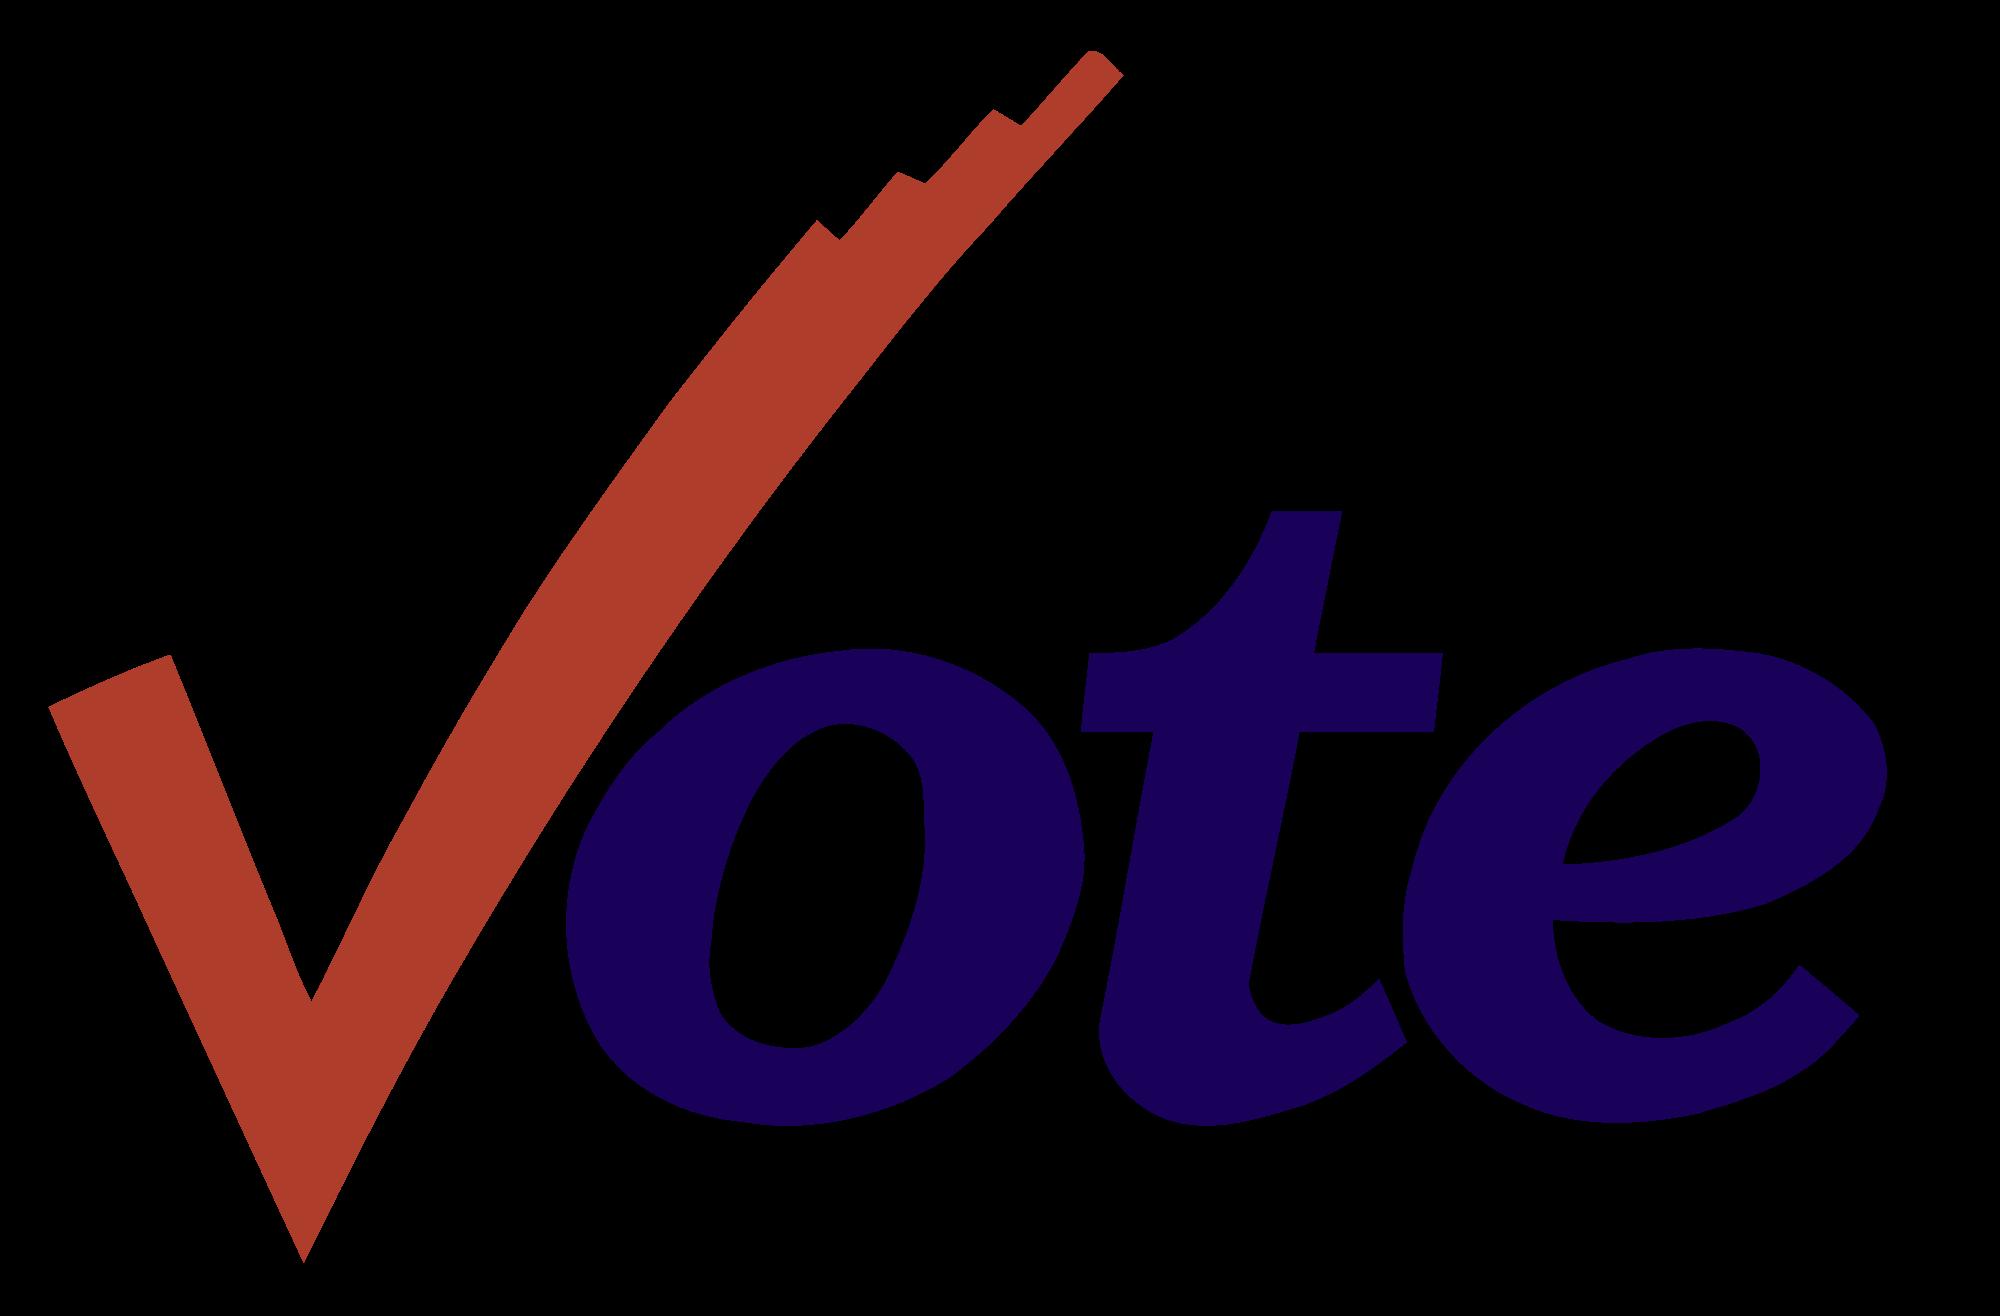 Vote PNG Images Transparent Free Download.